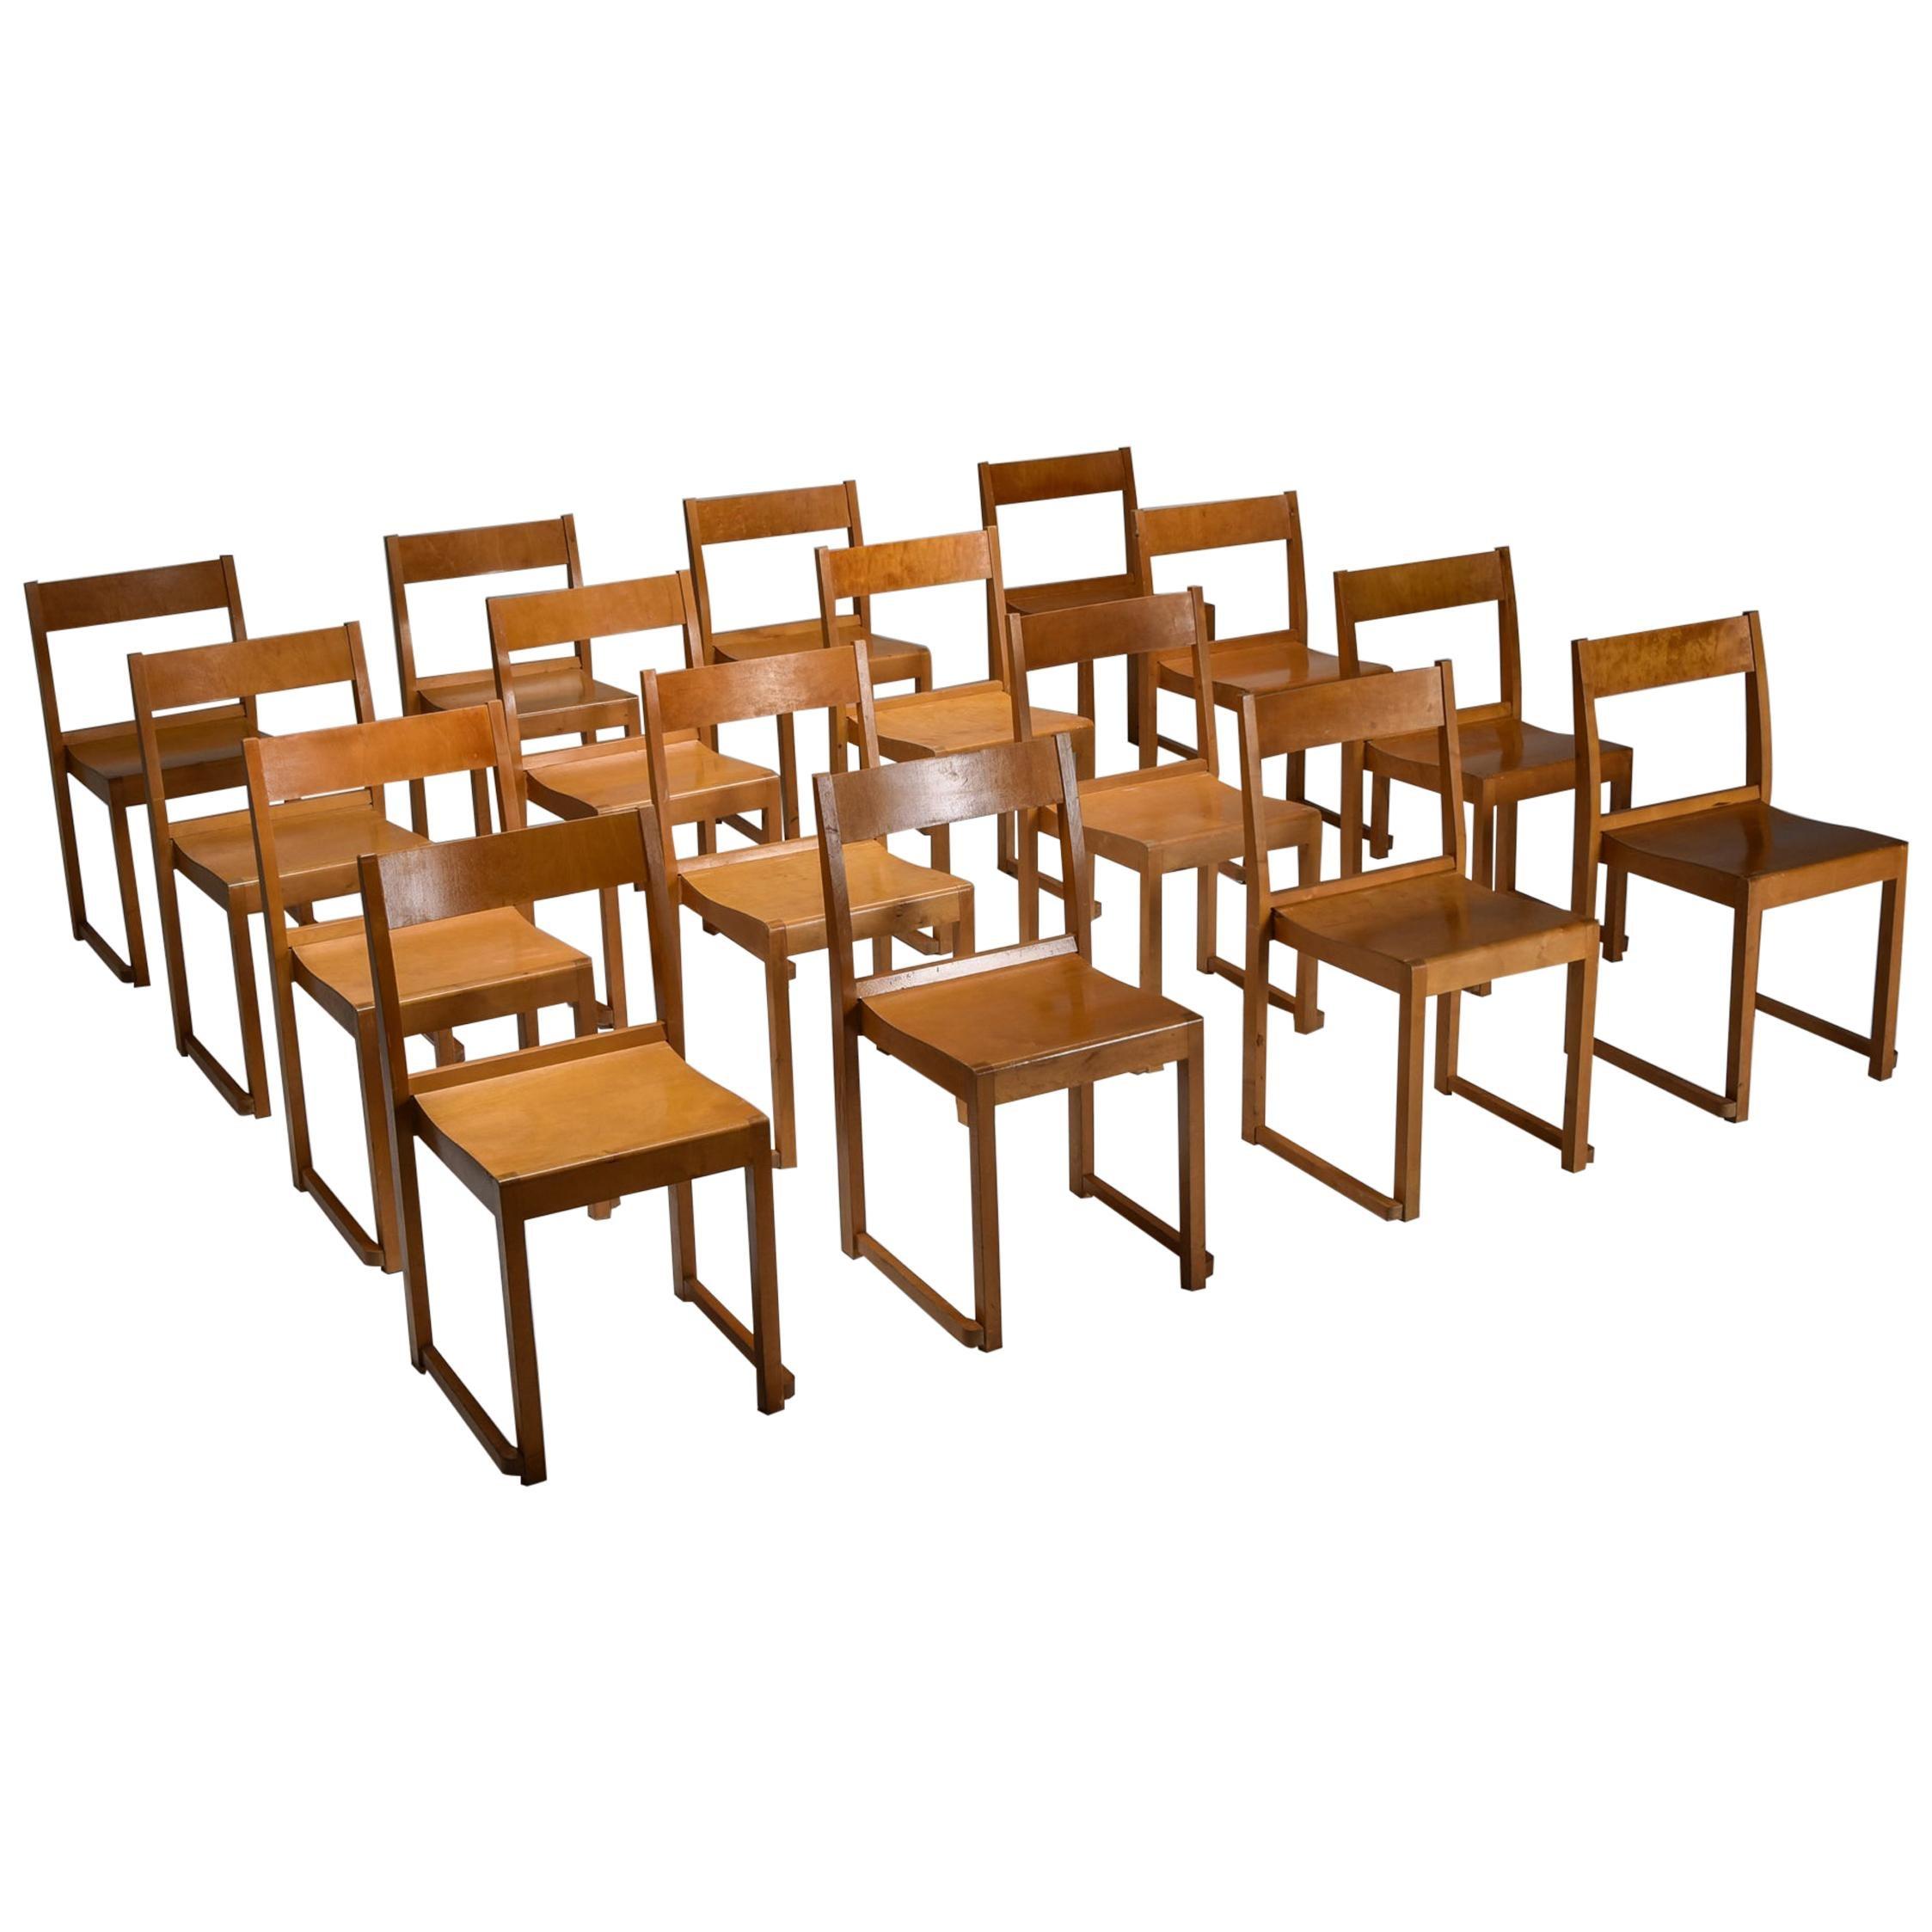 Sven Markelius 'Orchestra' Chairs